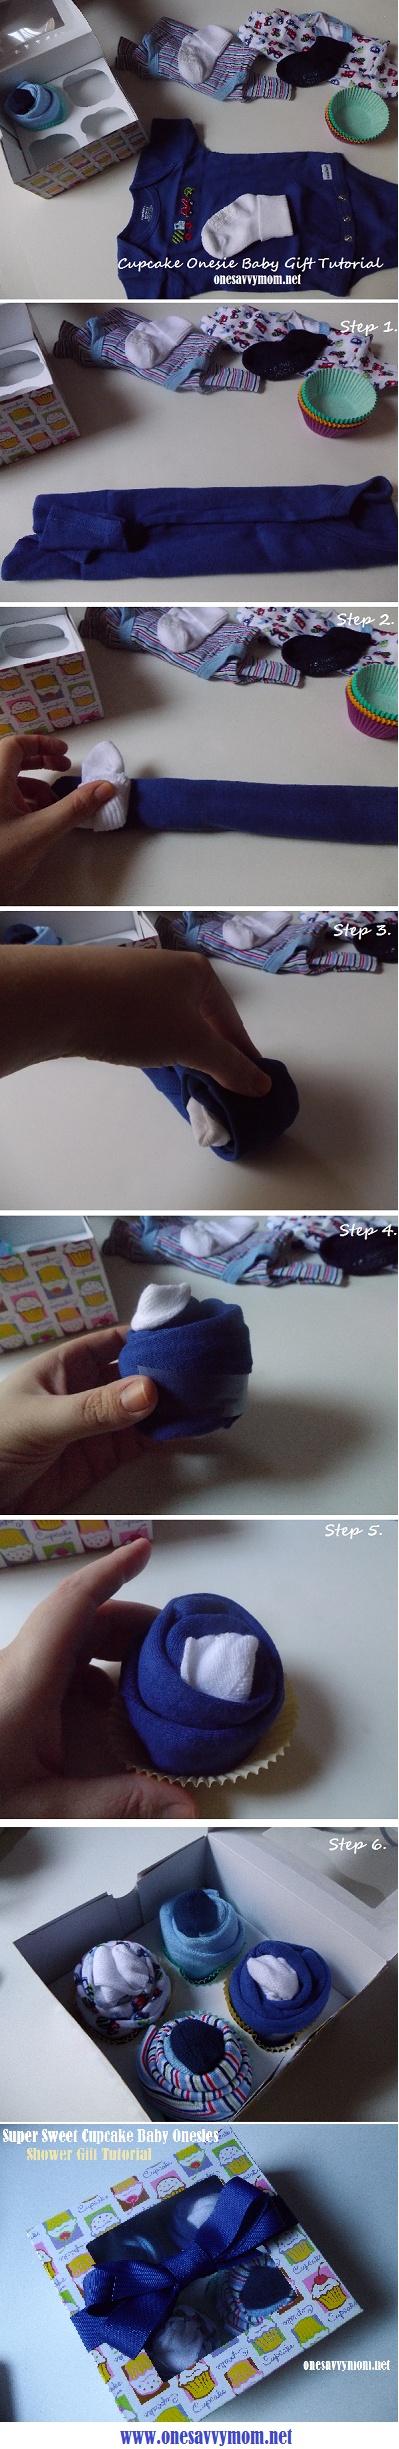 Cupcake Baby Onesie Baby Shower Gift Tutorial